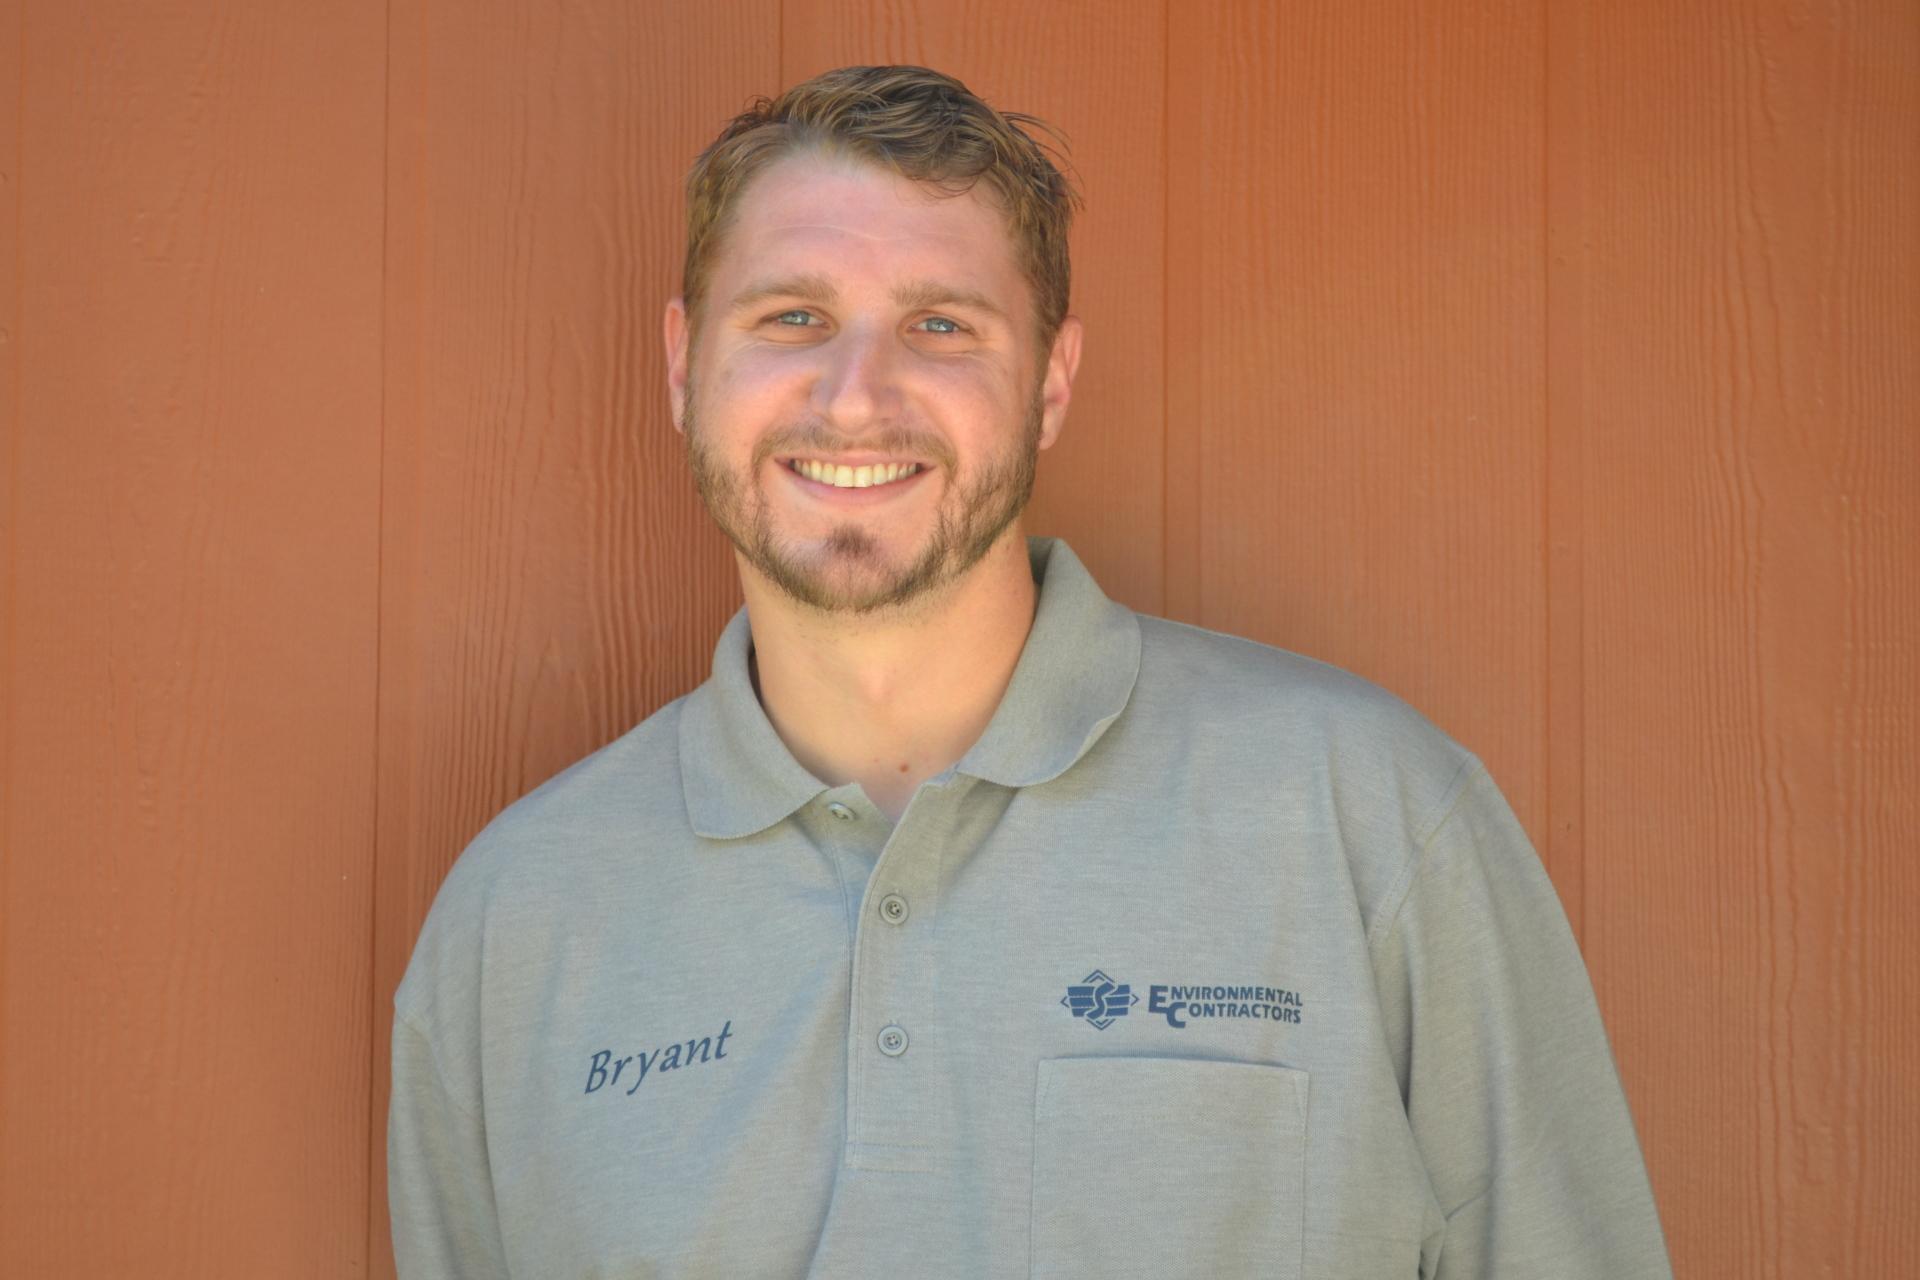 Bryant Ehrman